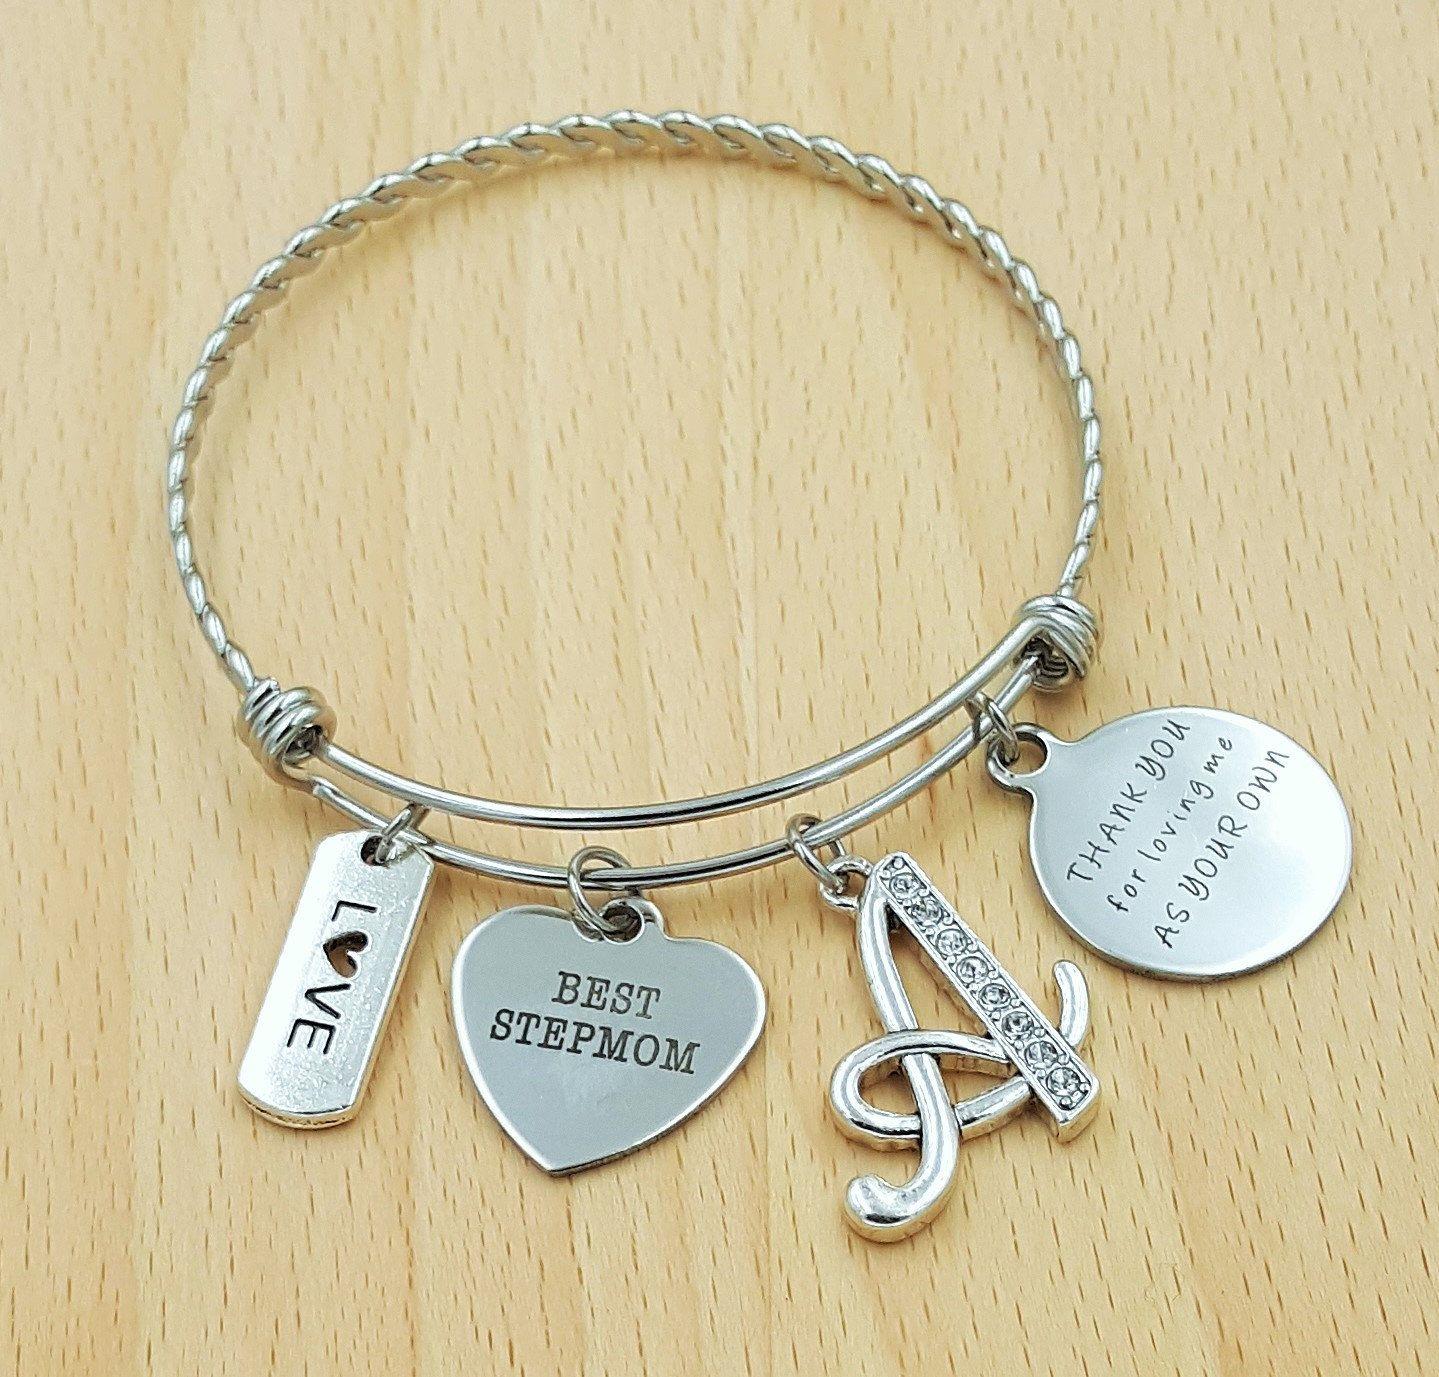 Step Mom Bracelet Gift Stepmom Gifts For Stepmother